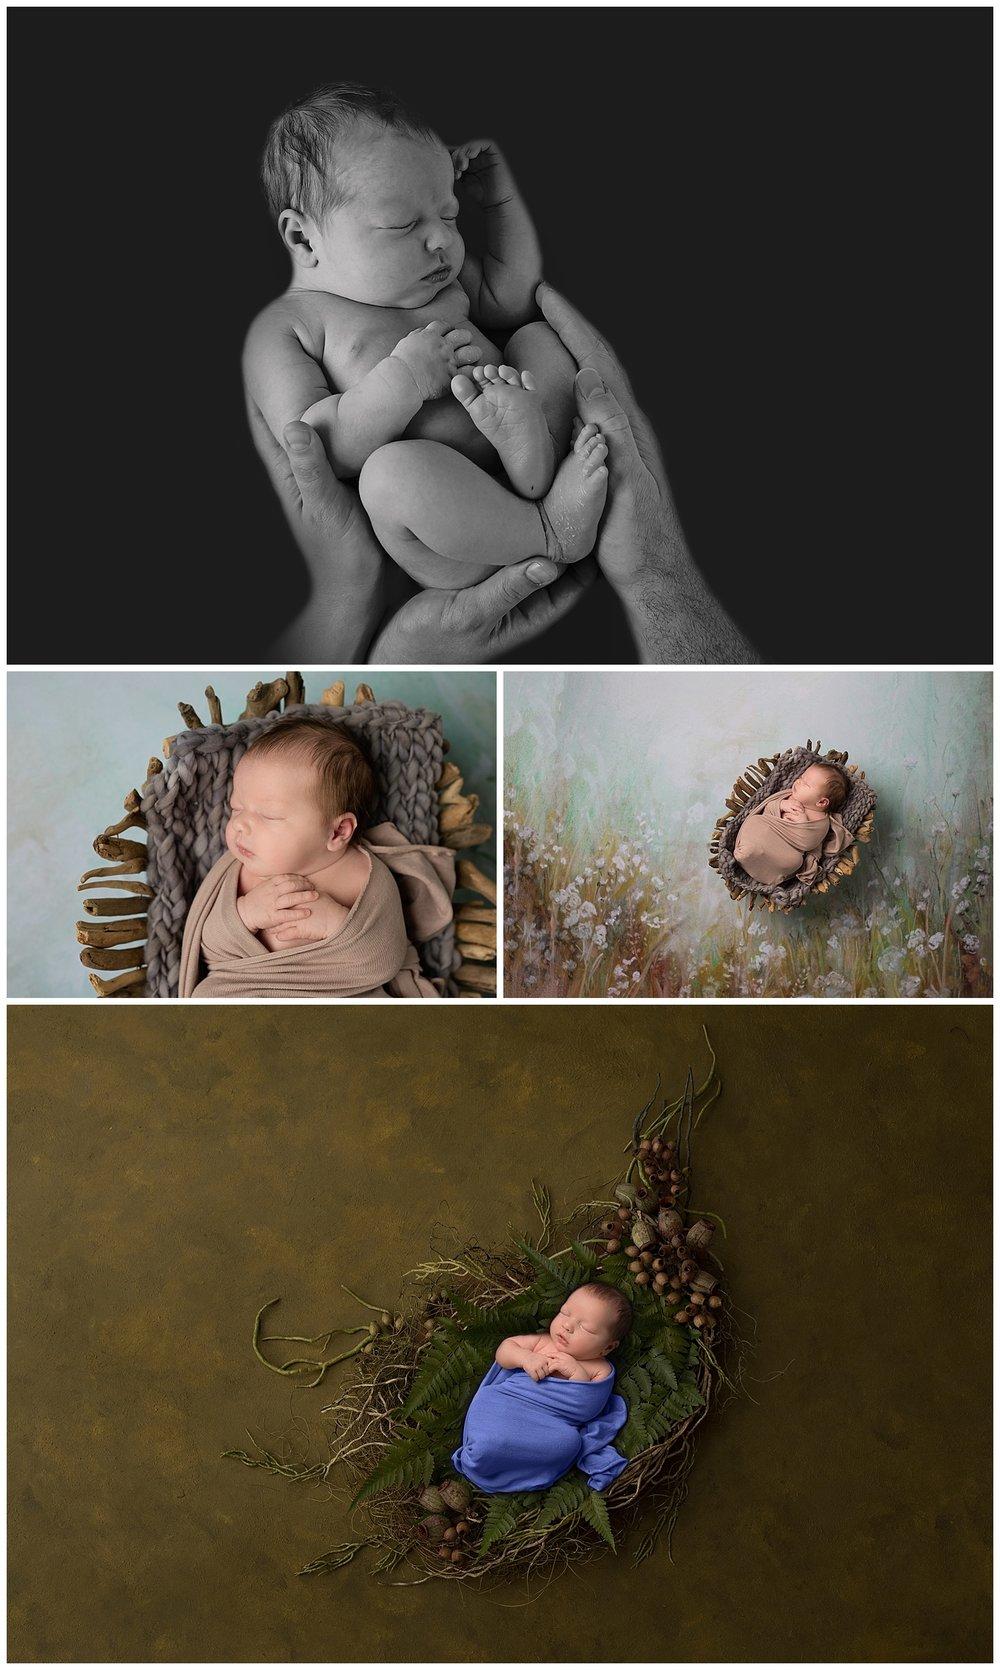 Raleigh Wake Forest Newborn Photography 02_4.jpg